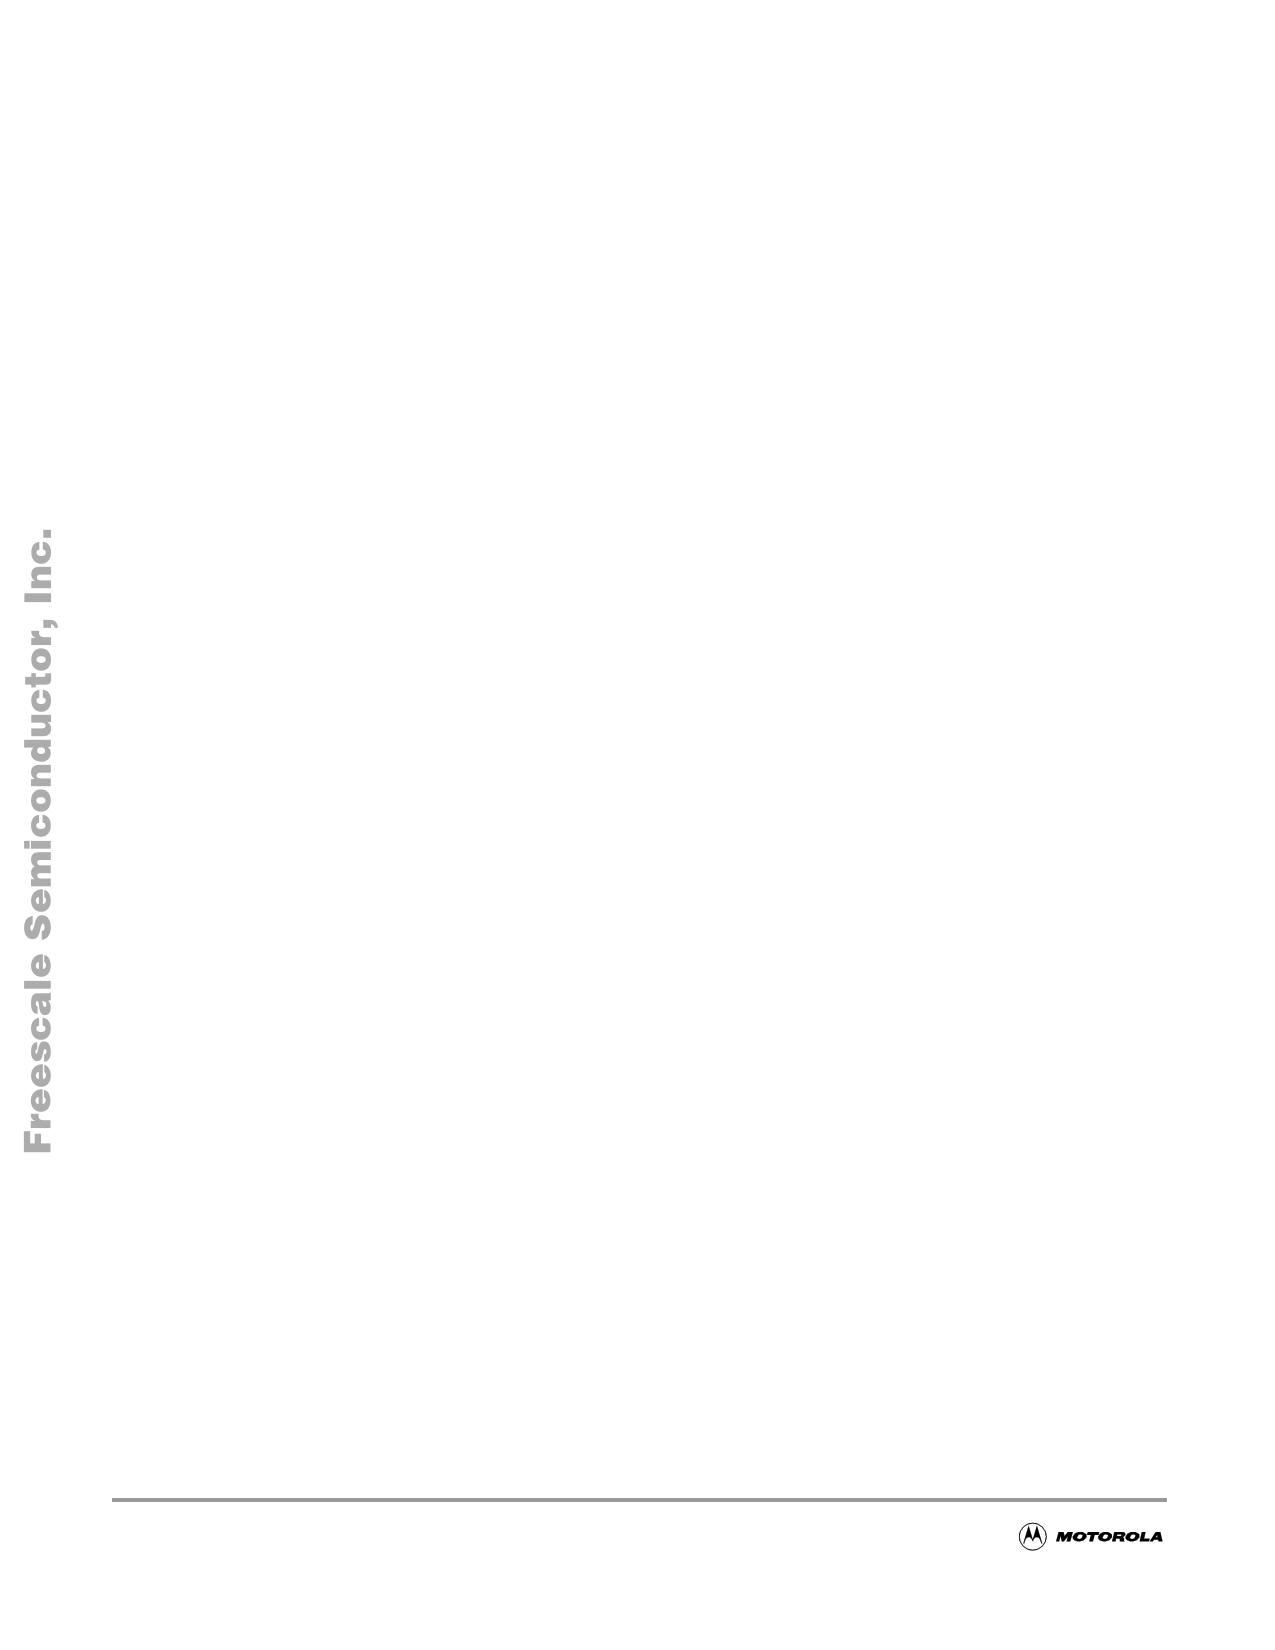 MC9S12DJ256B pdf, 반도체, 판매, 대치품